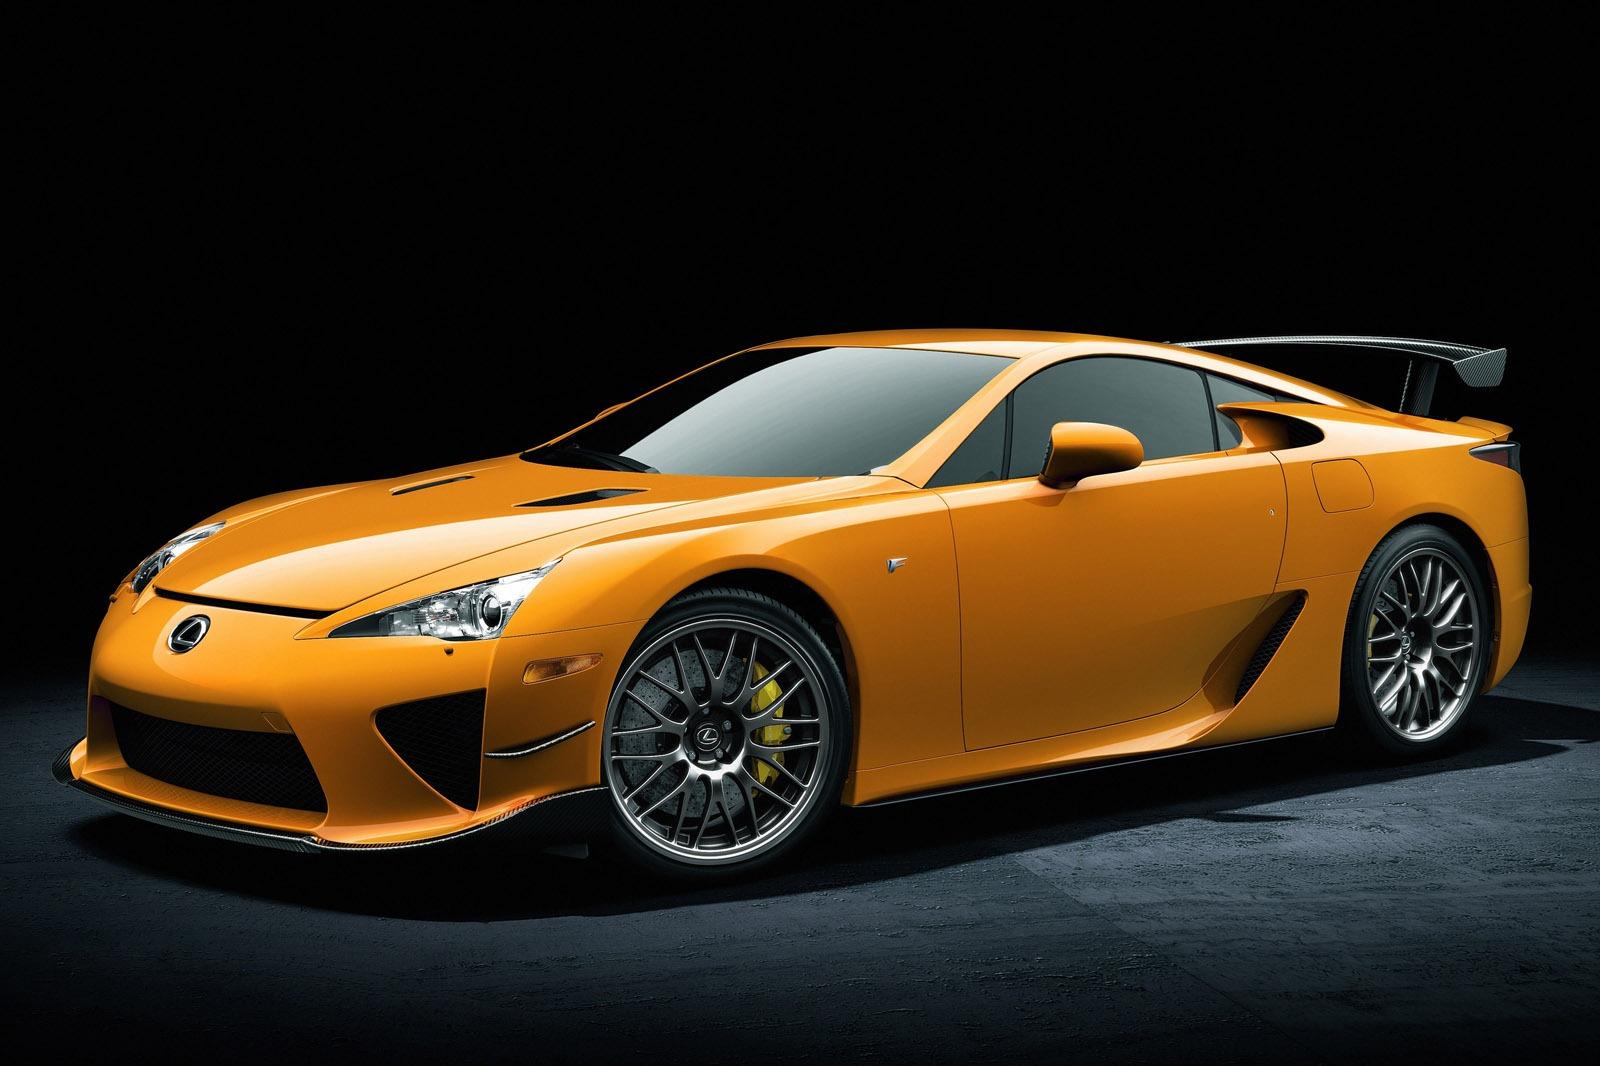 http://images.caradisiac.com/images/5/9/0/6/65906/S0-Geneve-2011-la-Lexus-LFA-Nurburgring-Edition-exposee-212387.jpg